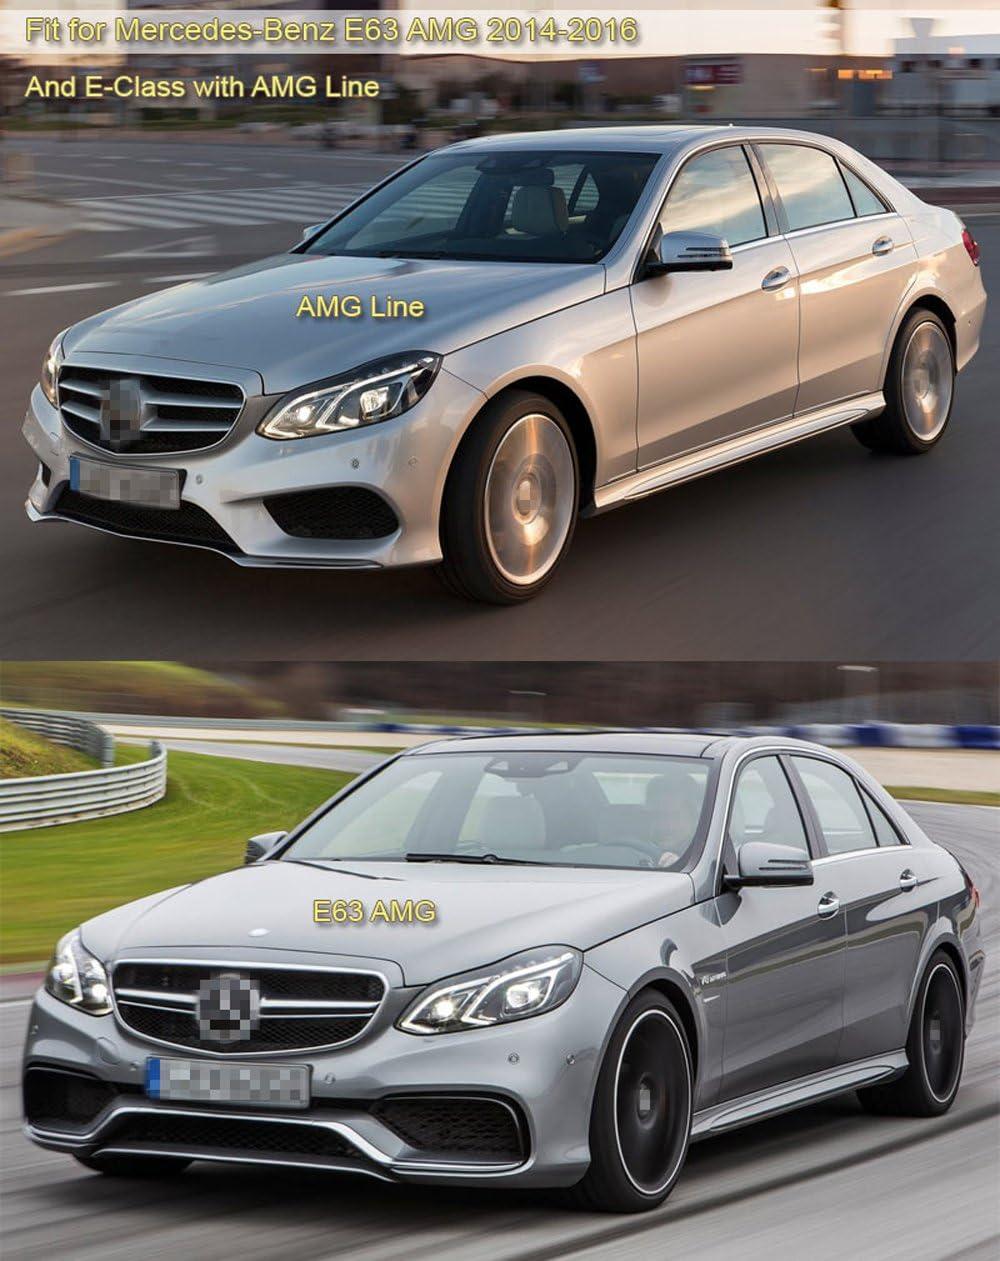 SPEEDLONG Car Mud Flaps Splash Guard Fender Mudguard for Mercedes-Benz GLA 45 AMG//GLA AMG Line 2015-2018 16 17